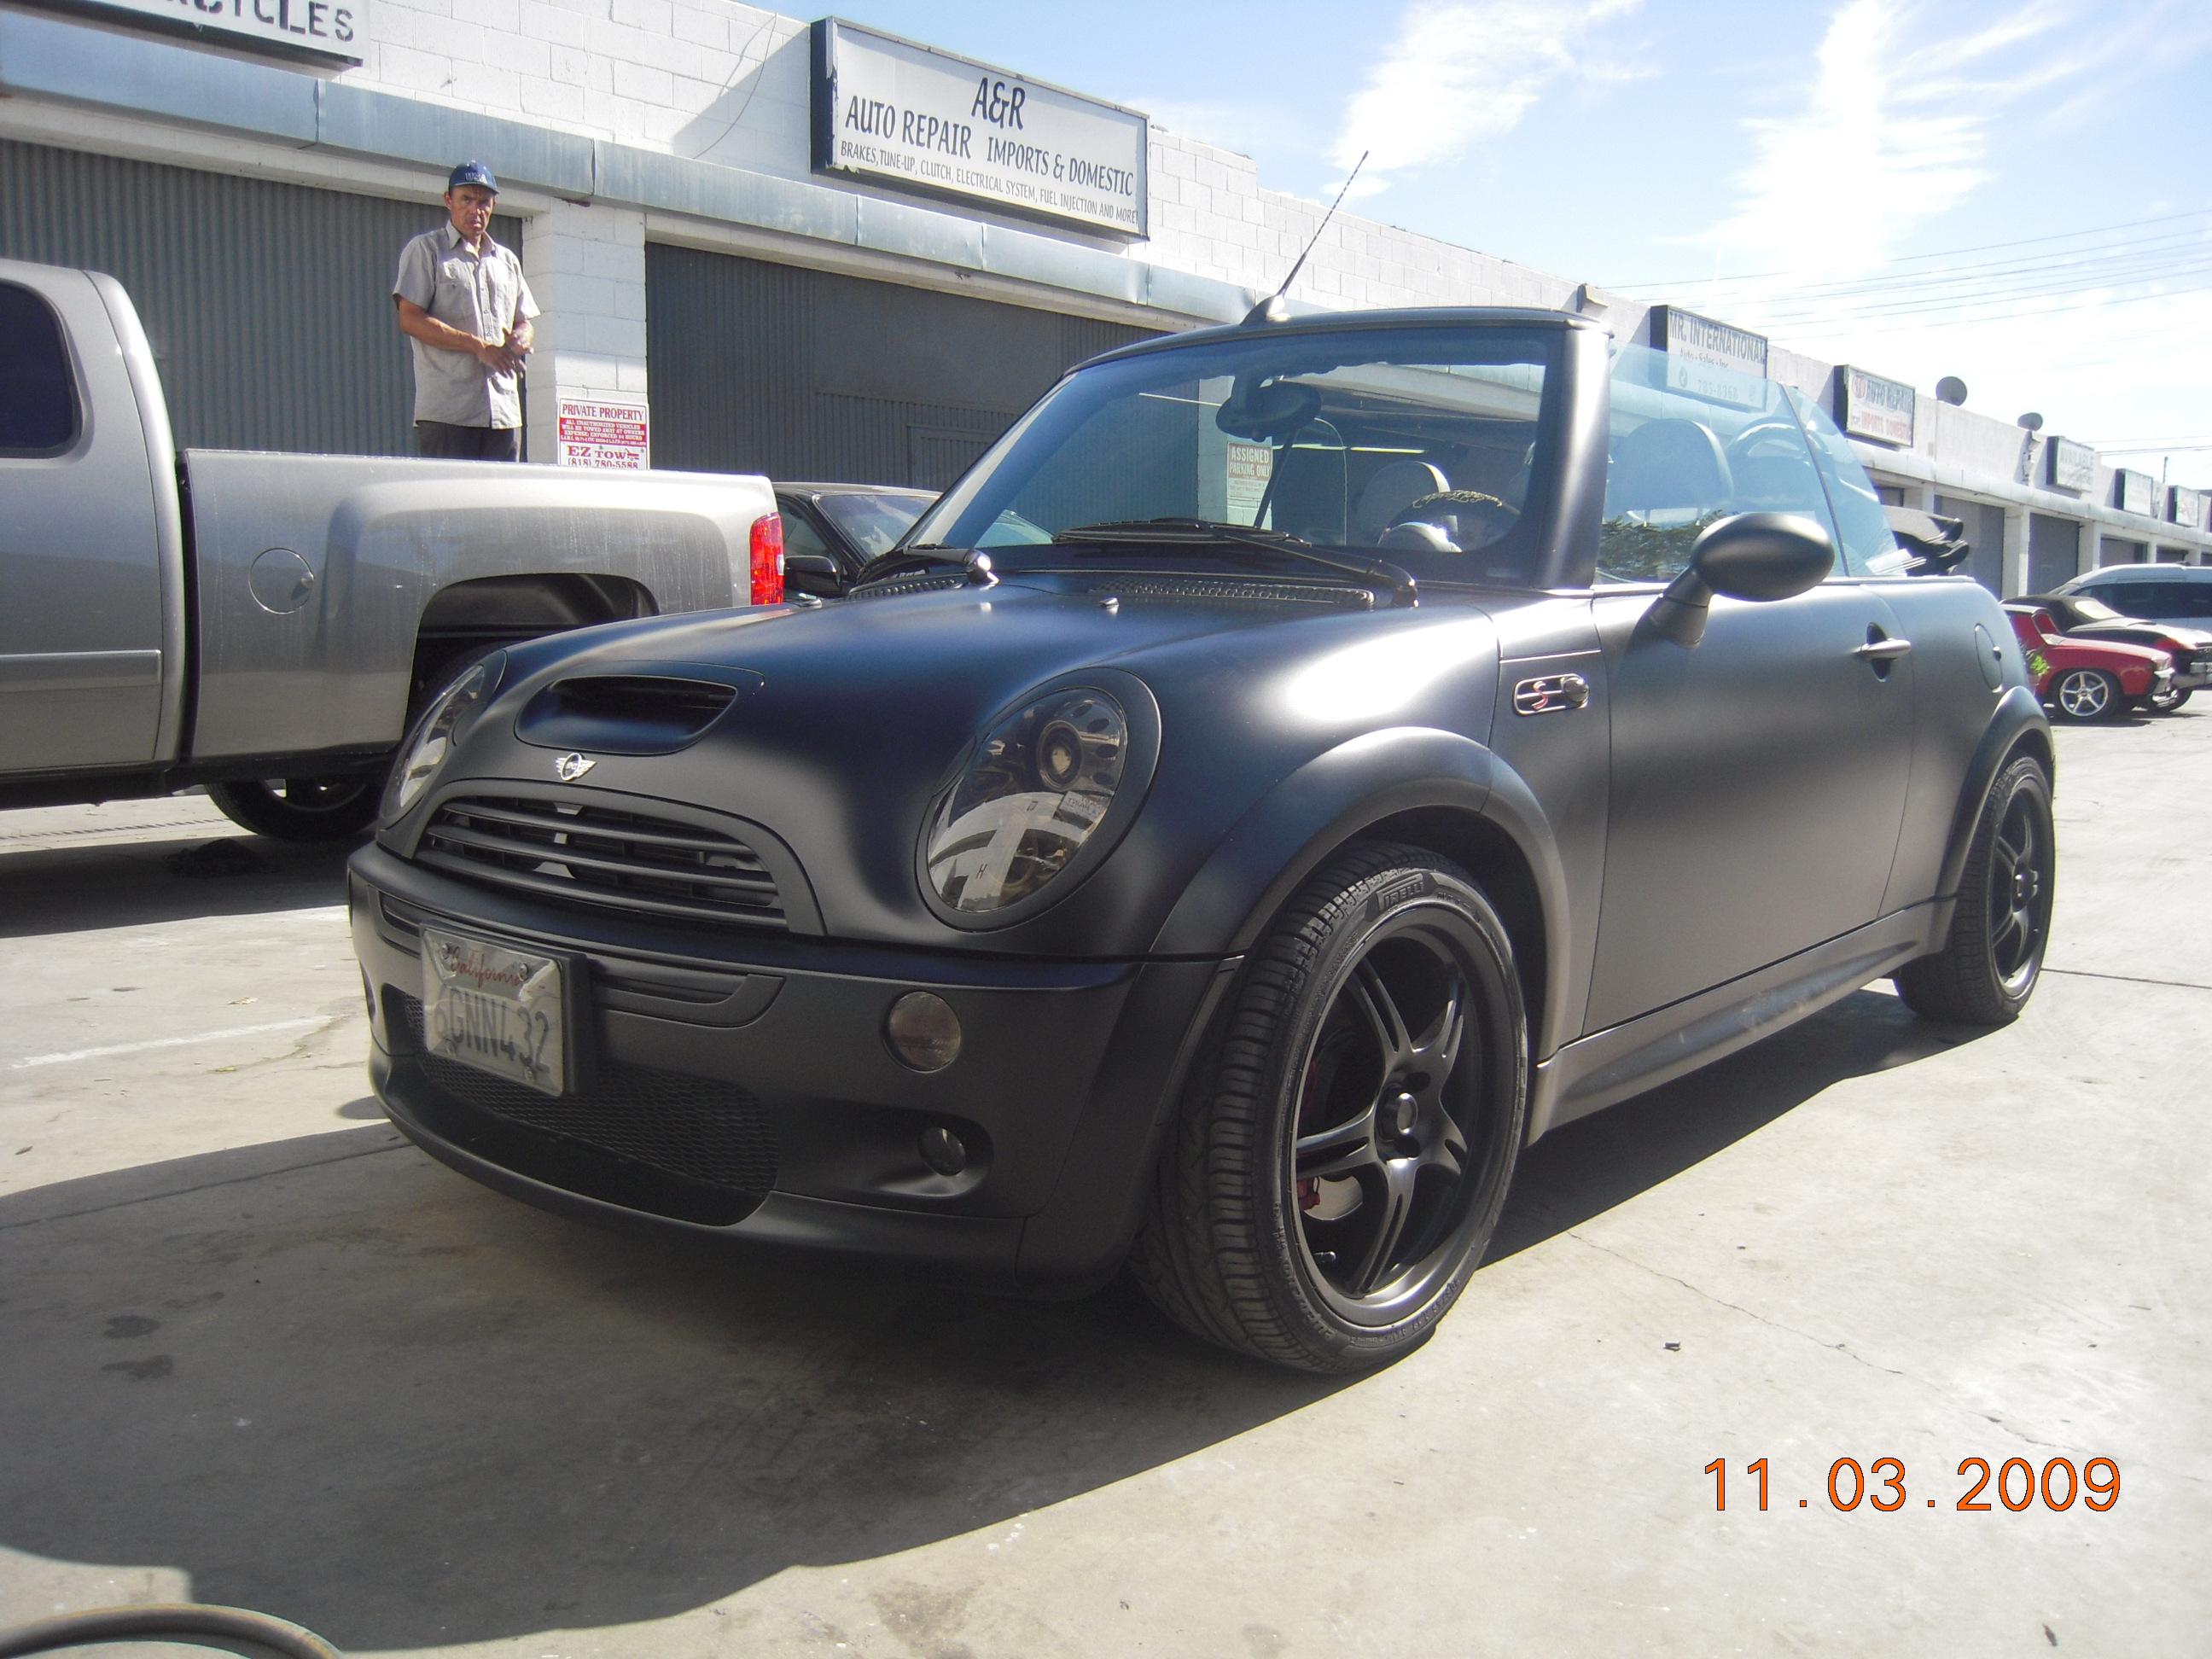 west-coast-body-and-paint-black-mini-cooper-matte-16